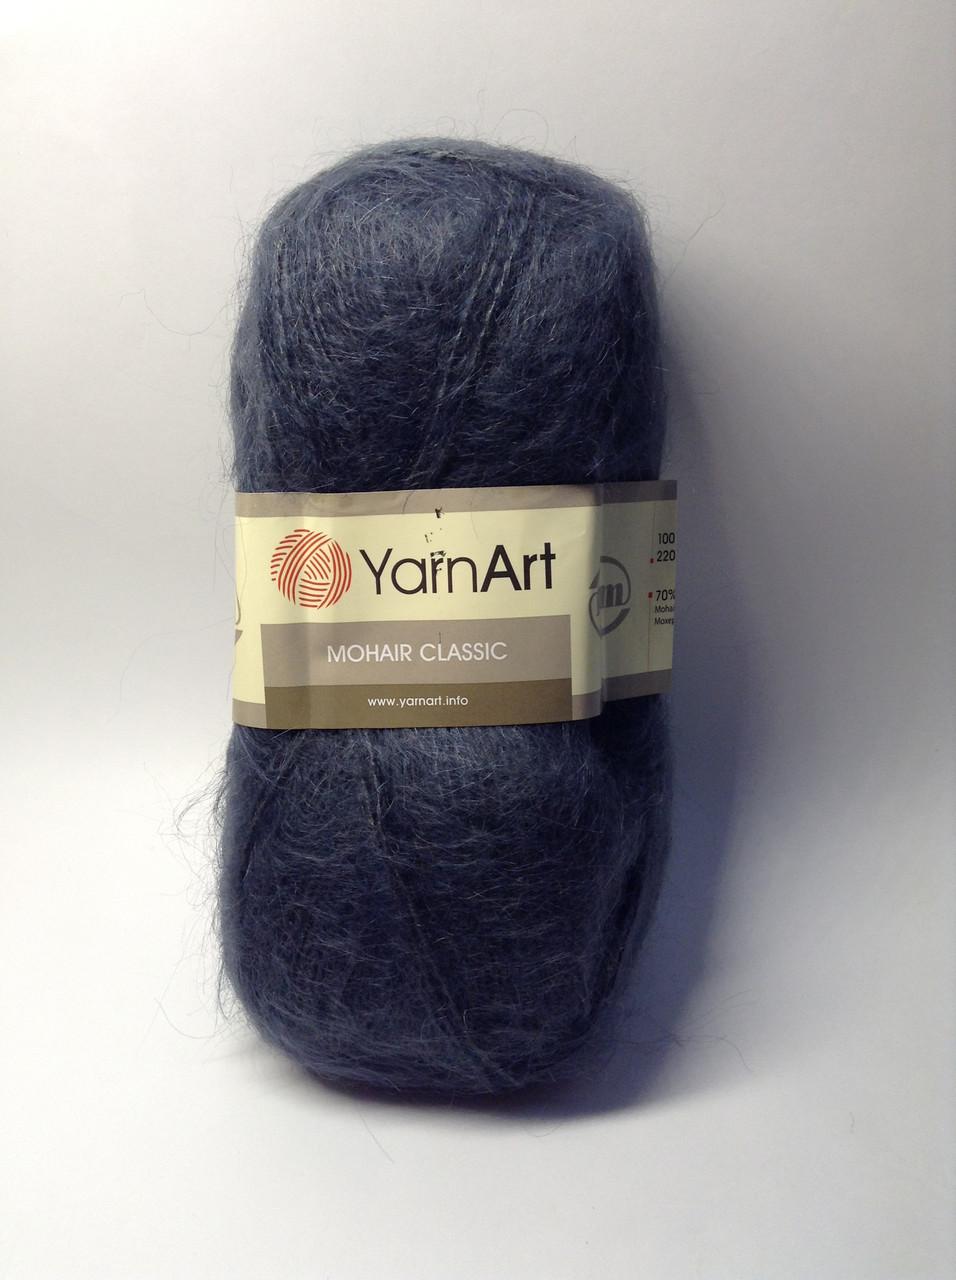 Пряжа Mohair classic YarnArt (70% -  80% мохера)